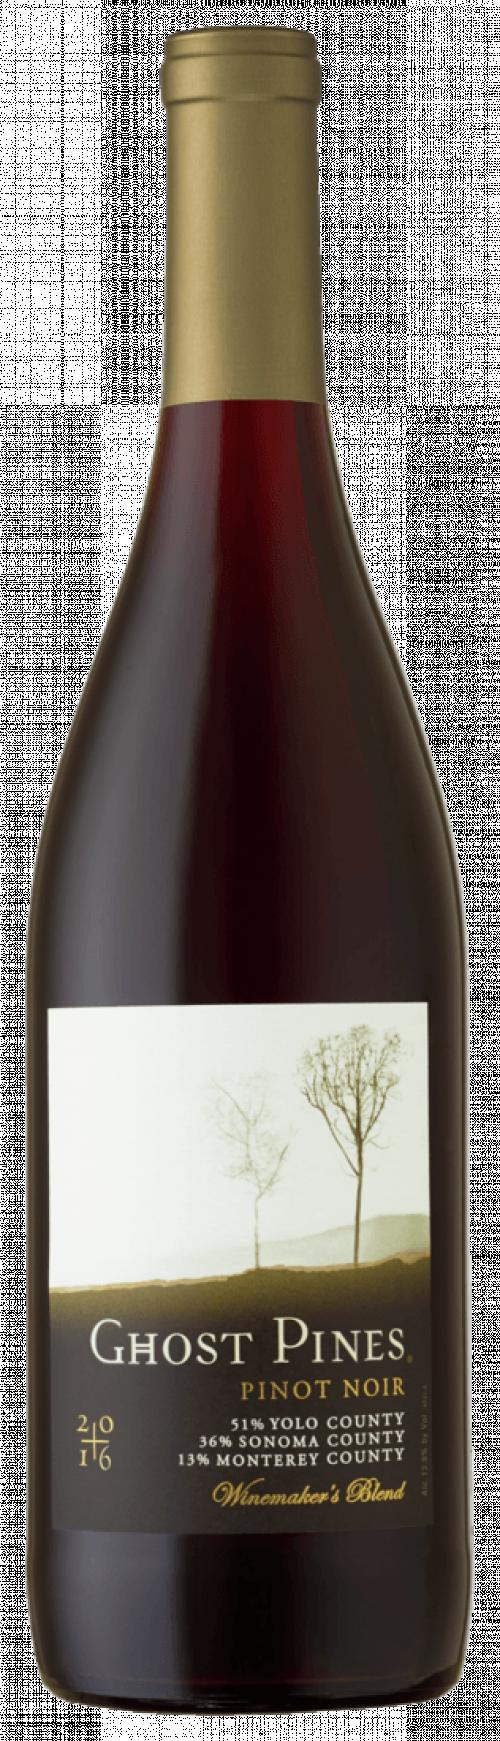 2016 Ghost Pines Pinot Noir 750ml